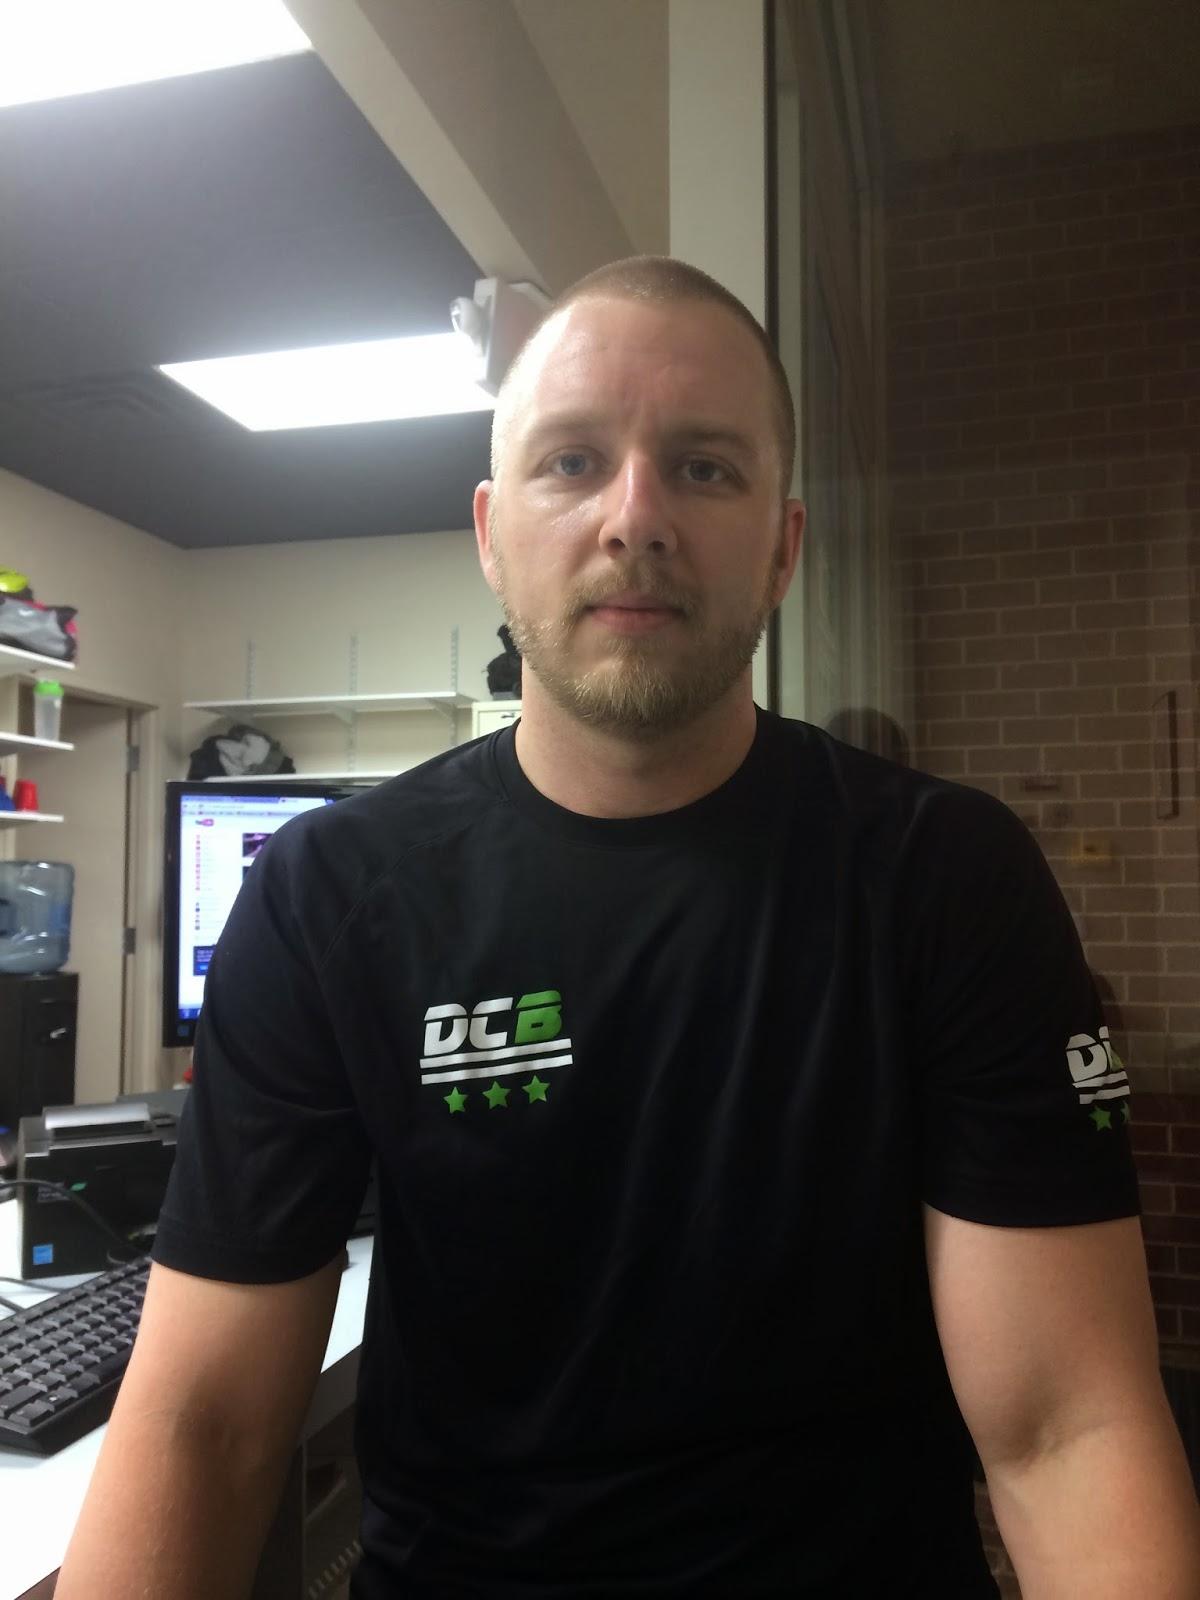 MMA in the DMV: DCBFit - James Kellaris